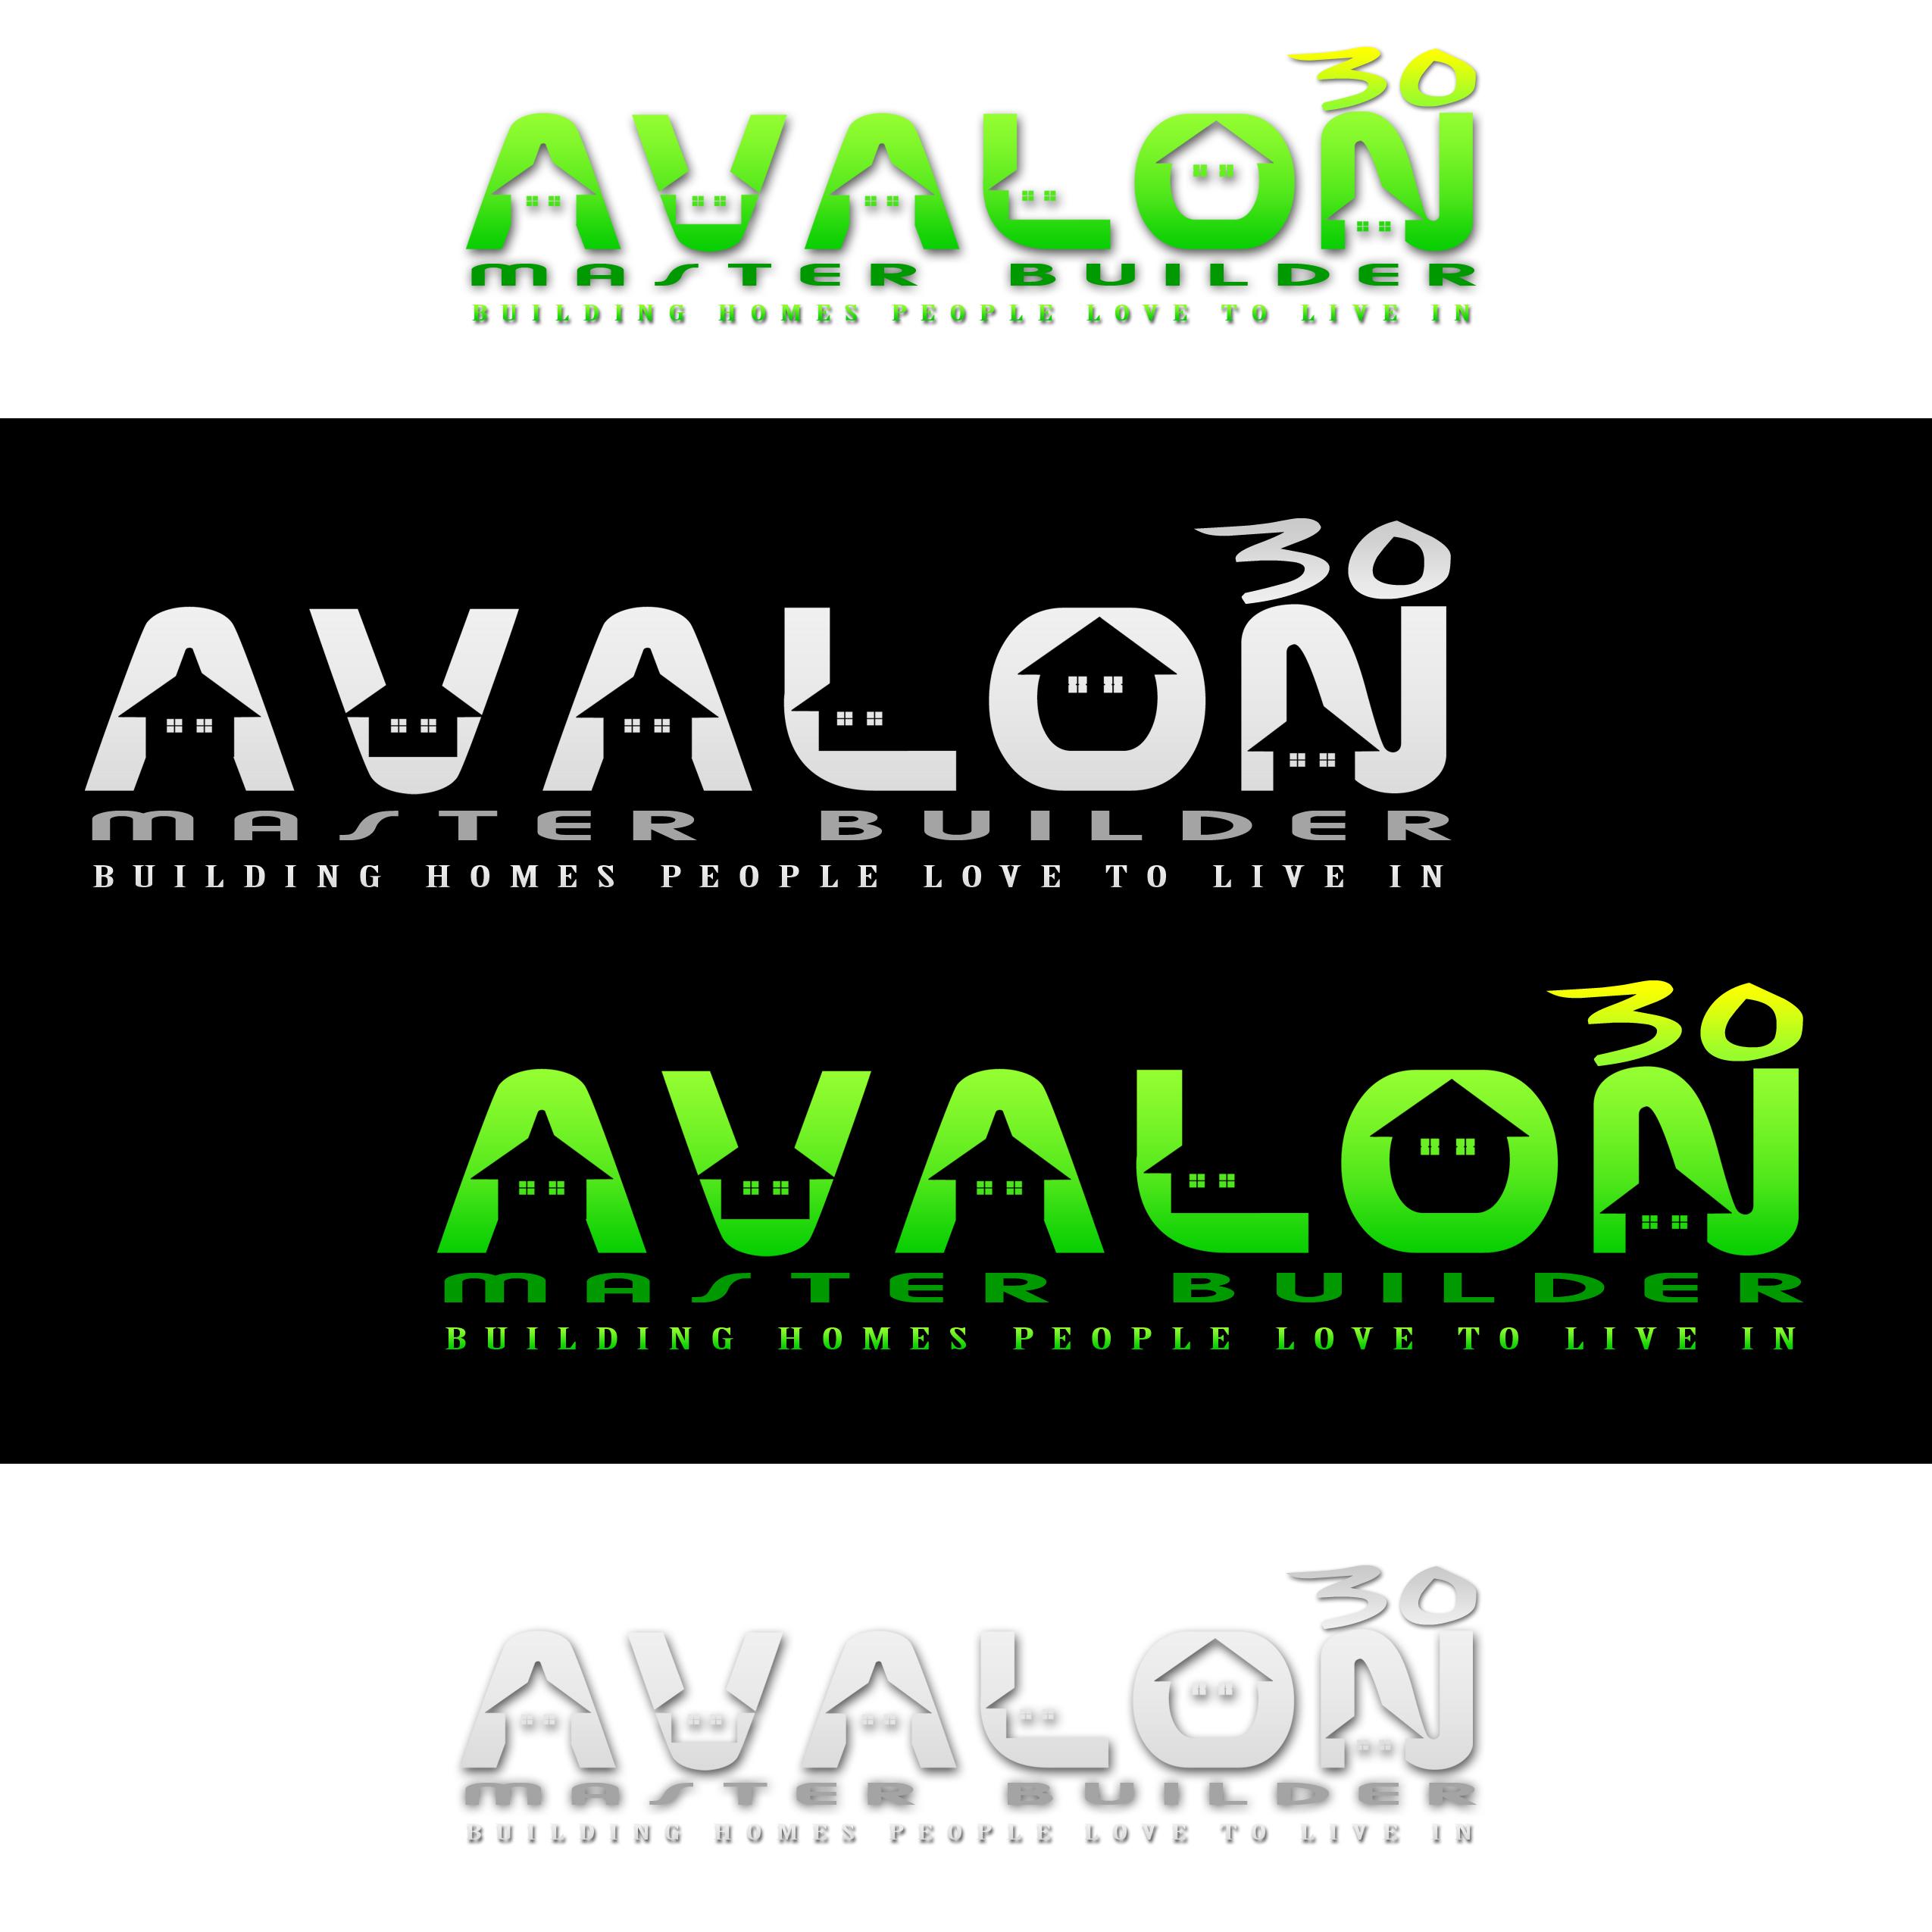 Logo Design by omARTist - Entry No. 38 in the Logo Design Contest Avalon Master Builder Logo Design.